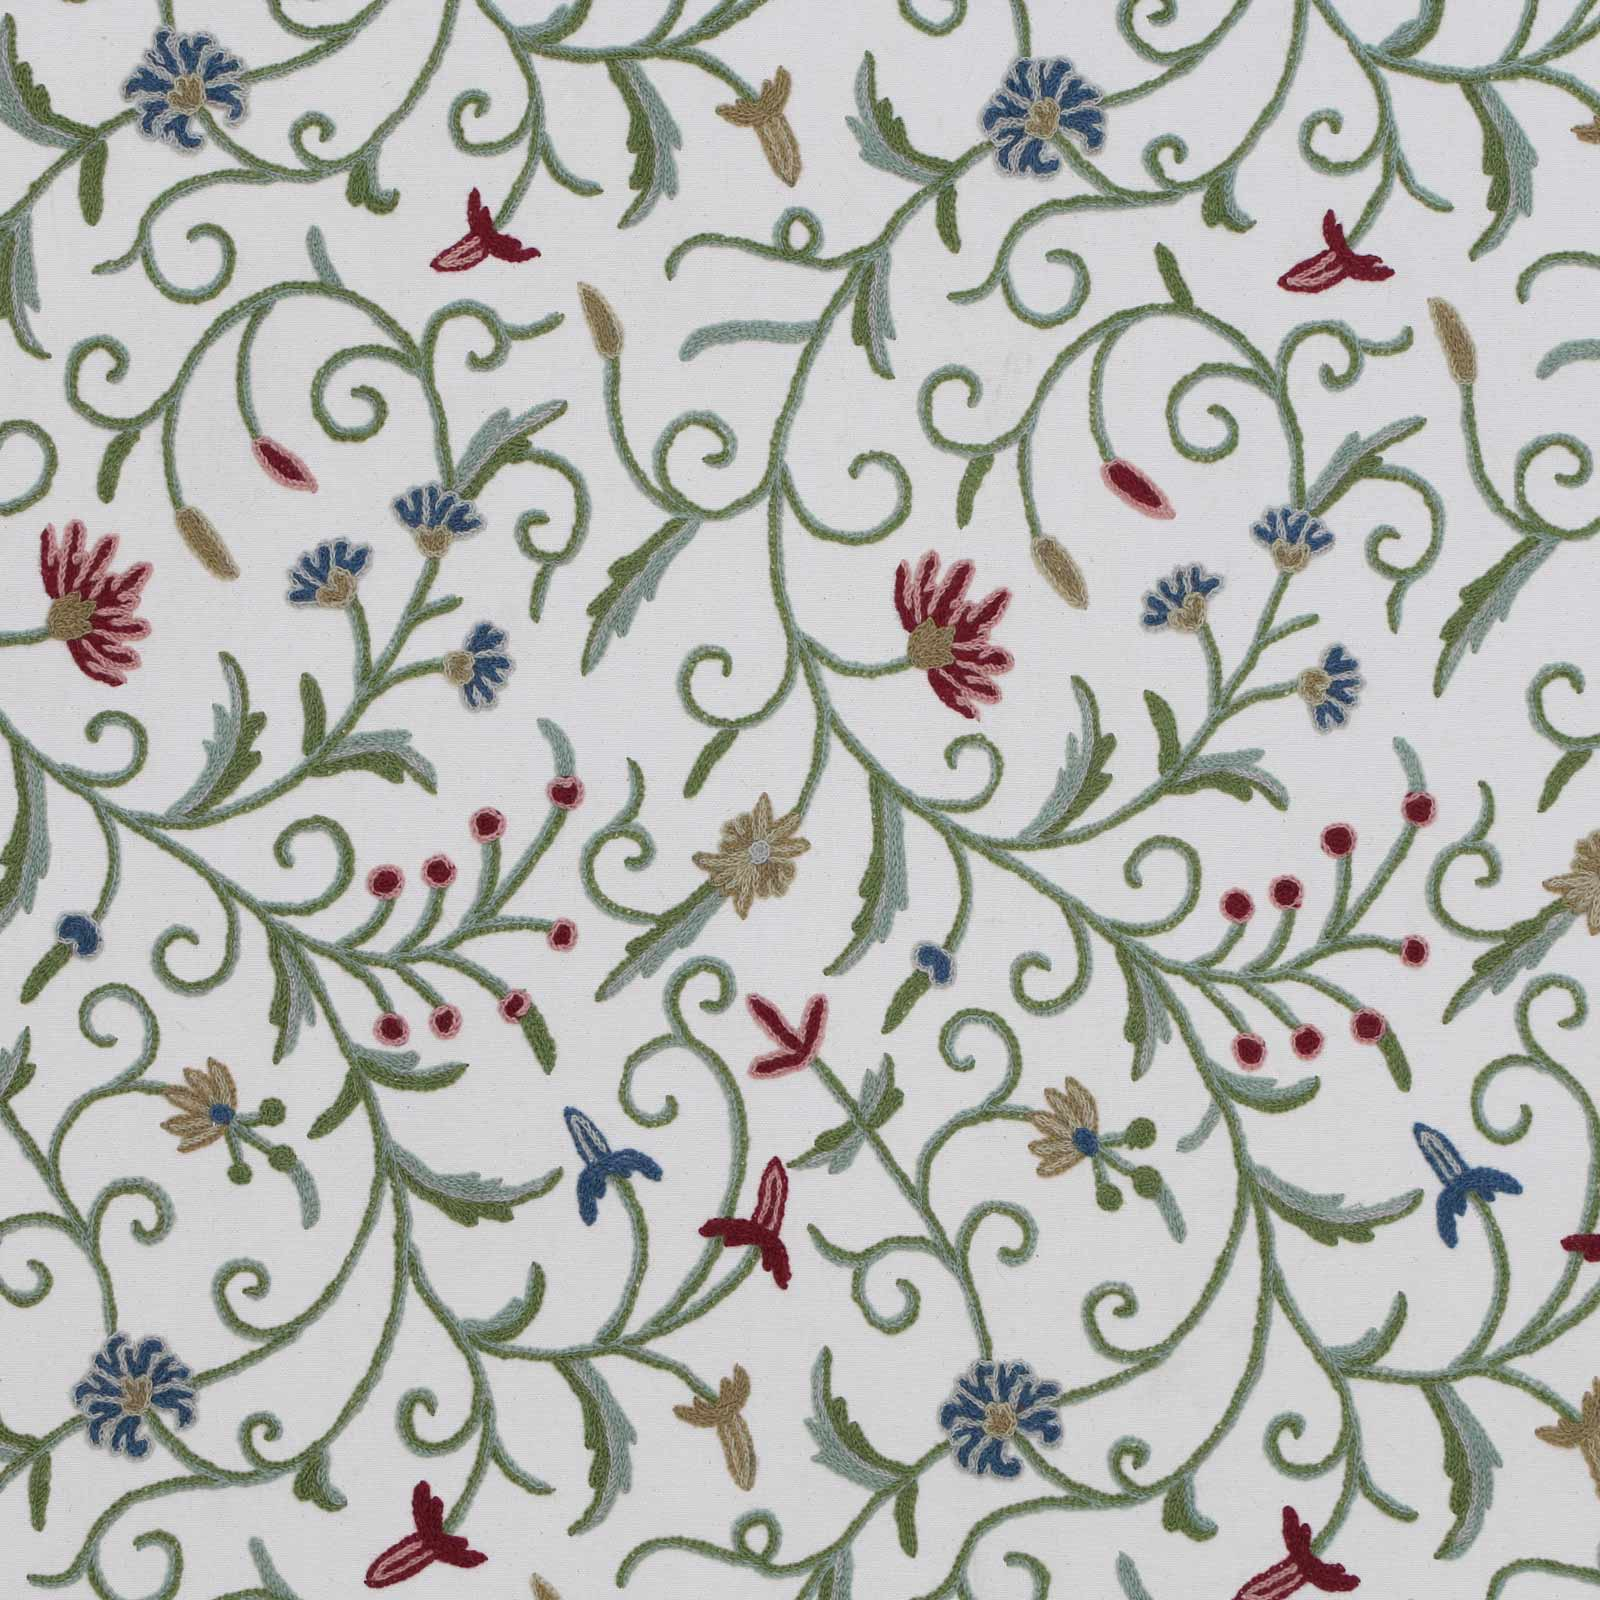 Kashmir Watlab Crewel Work Hand Embroidered Upholstery Fabric